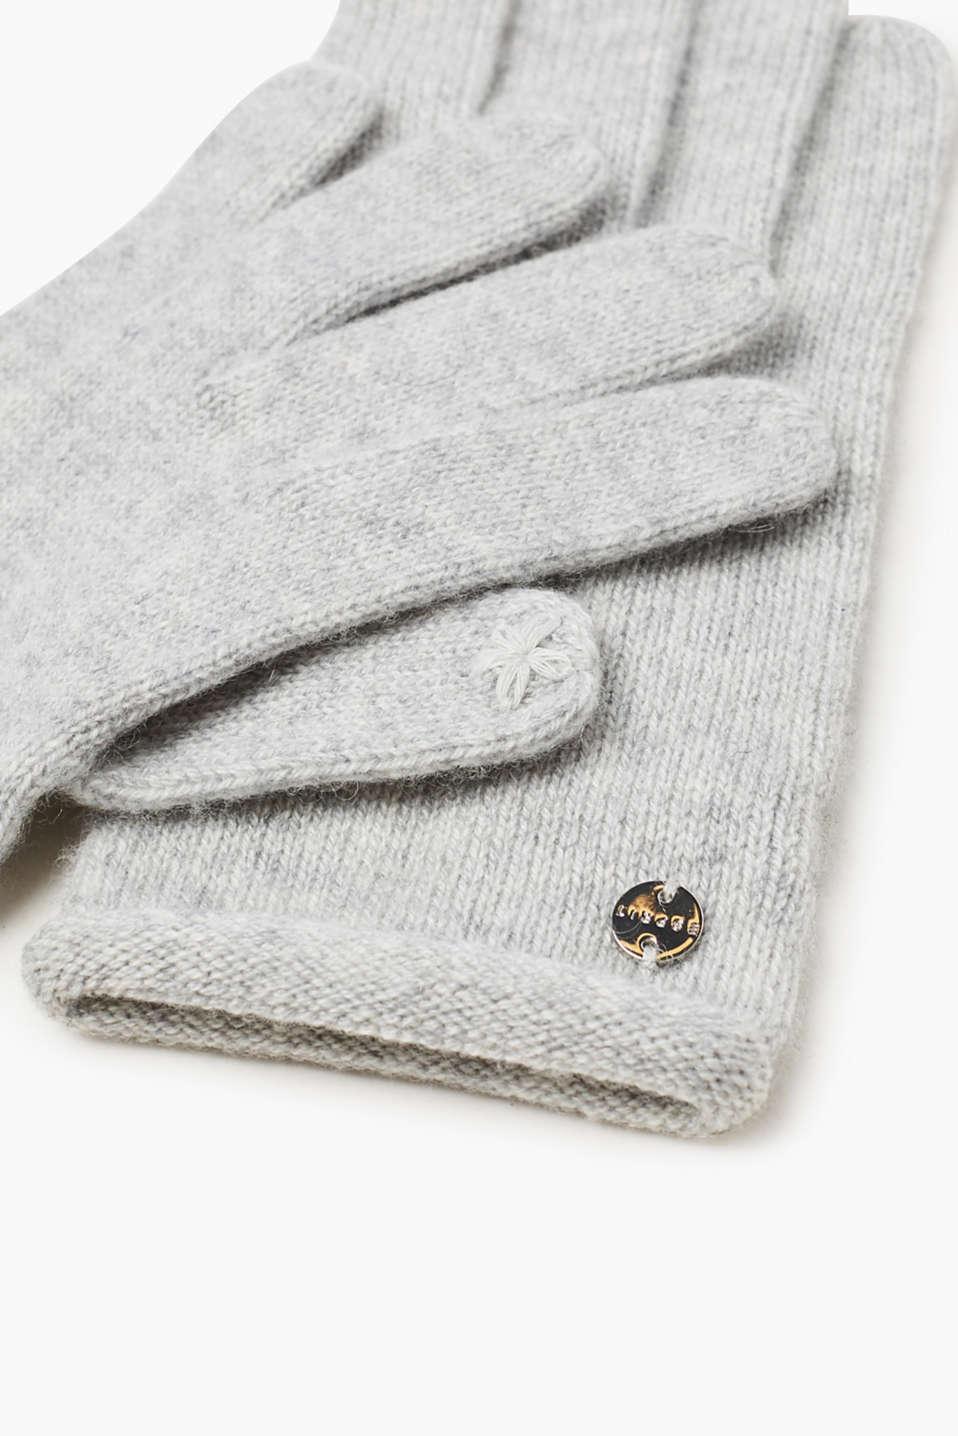 esprit touchscreen handschuhe mit kaschmir im online shop kaufen. Black Bedroom Furniture Sets. Home Design Ideas